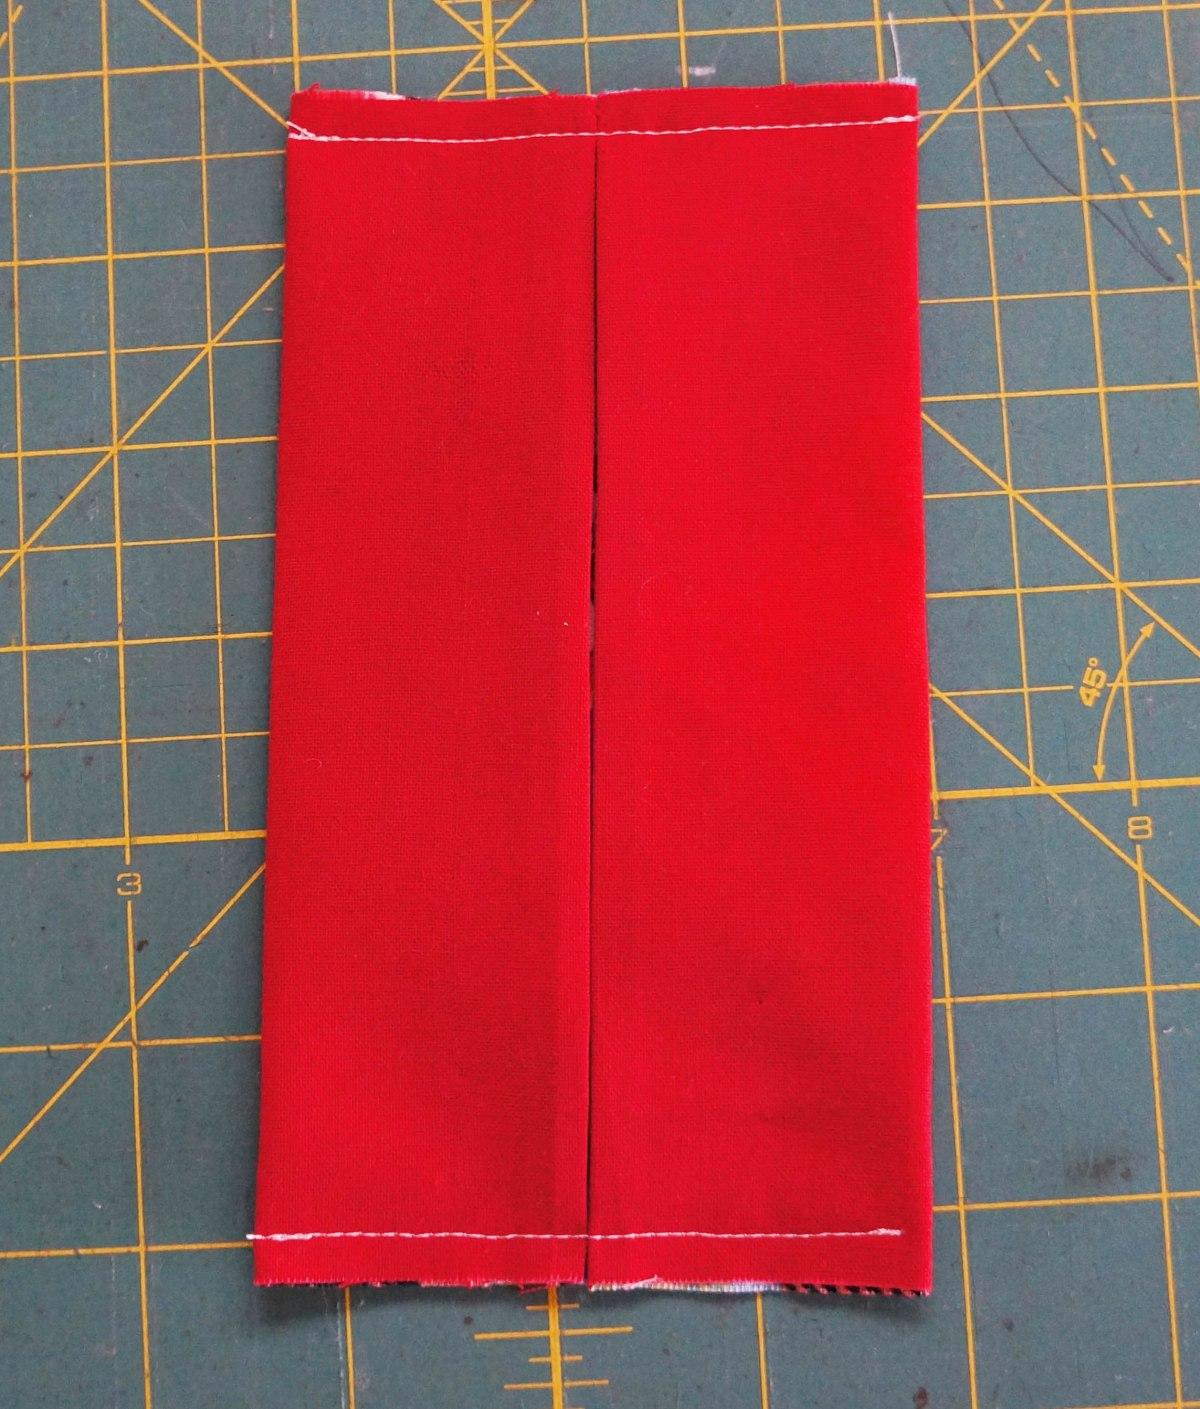 Tissue cover6